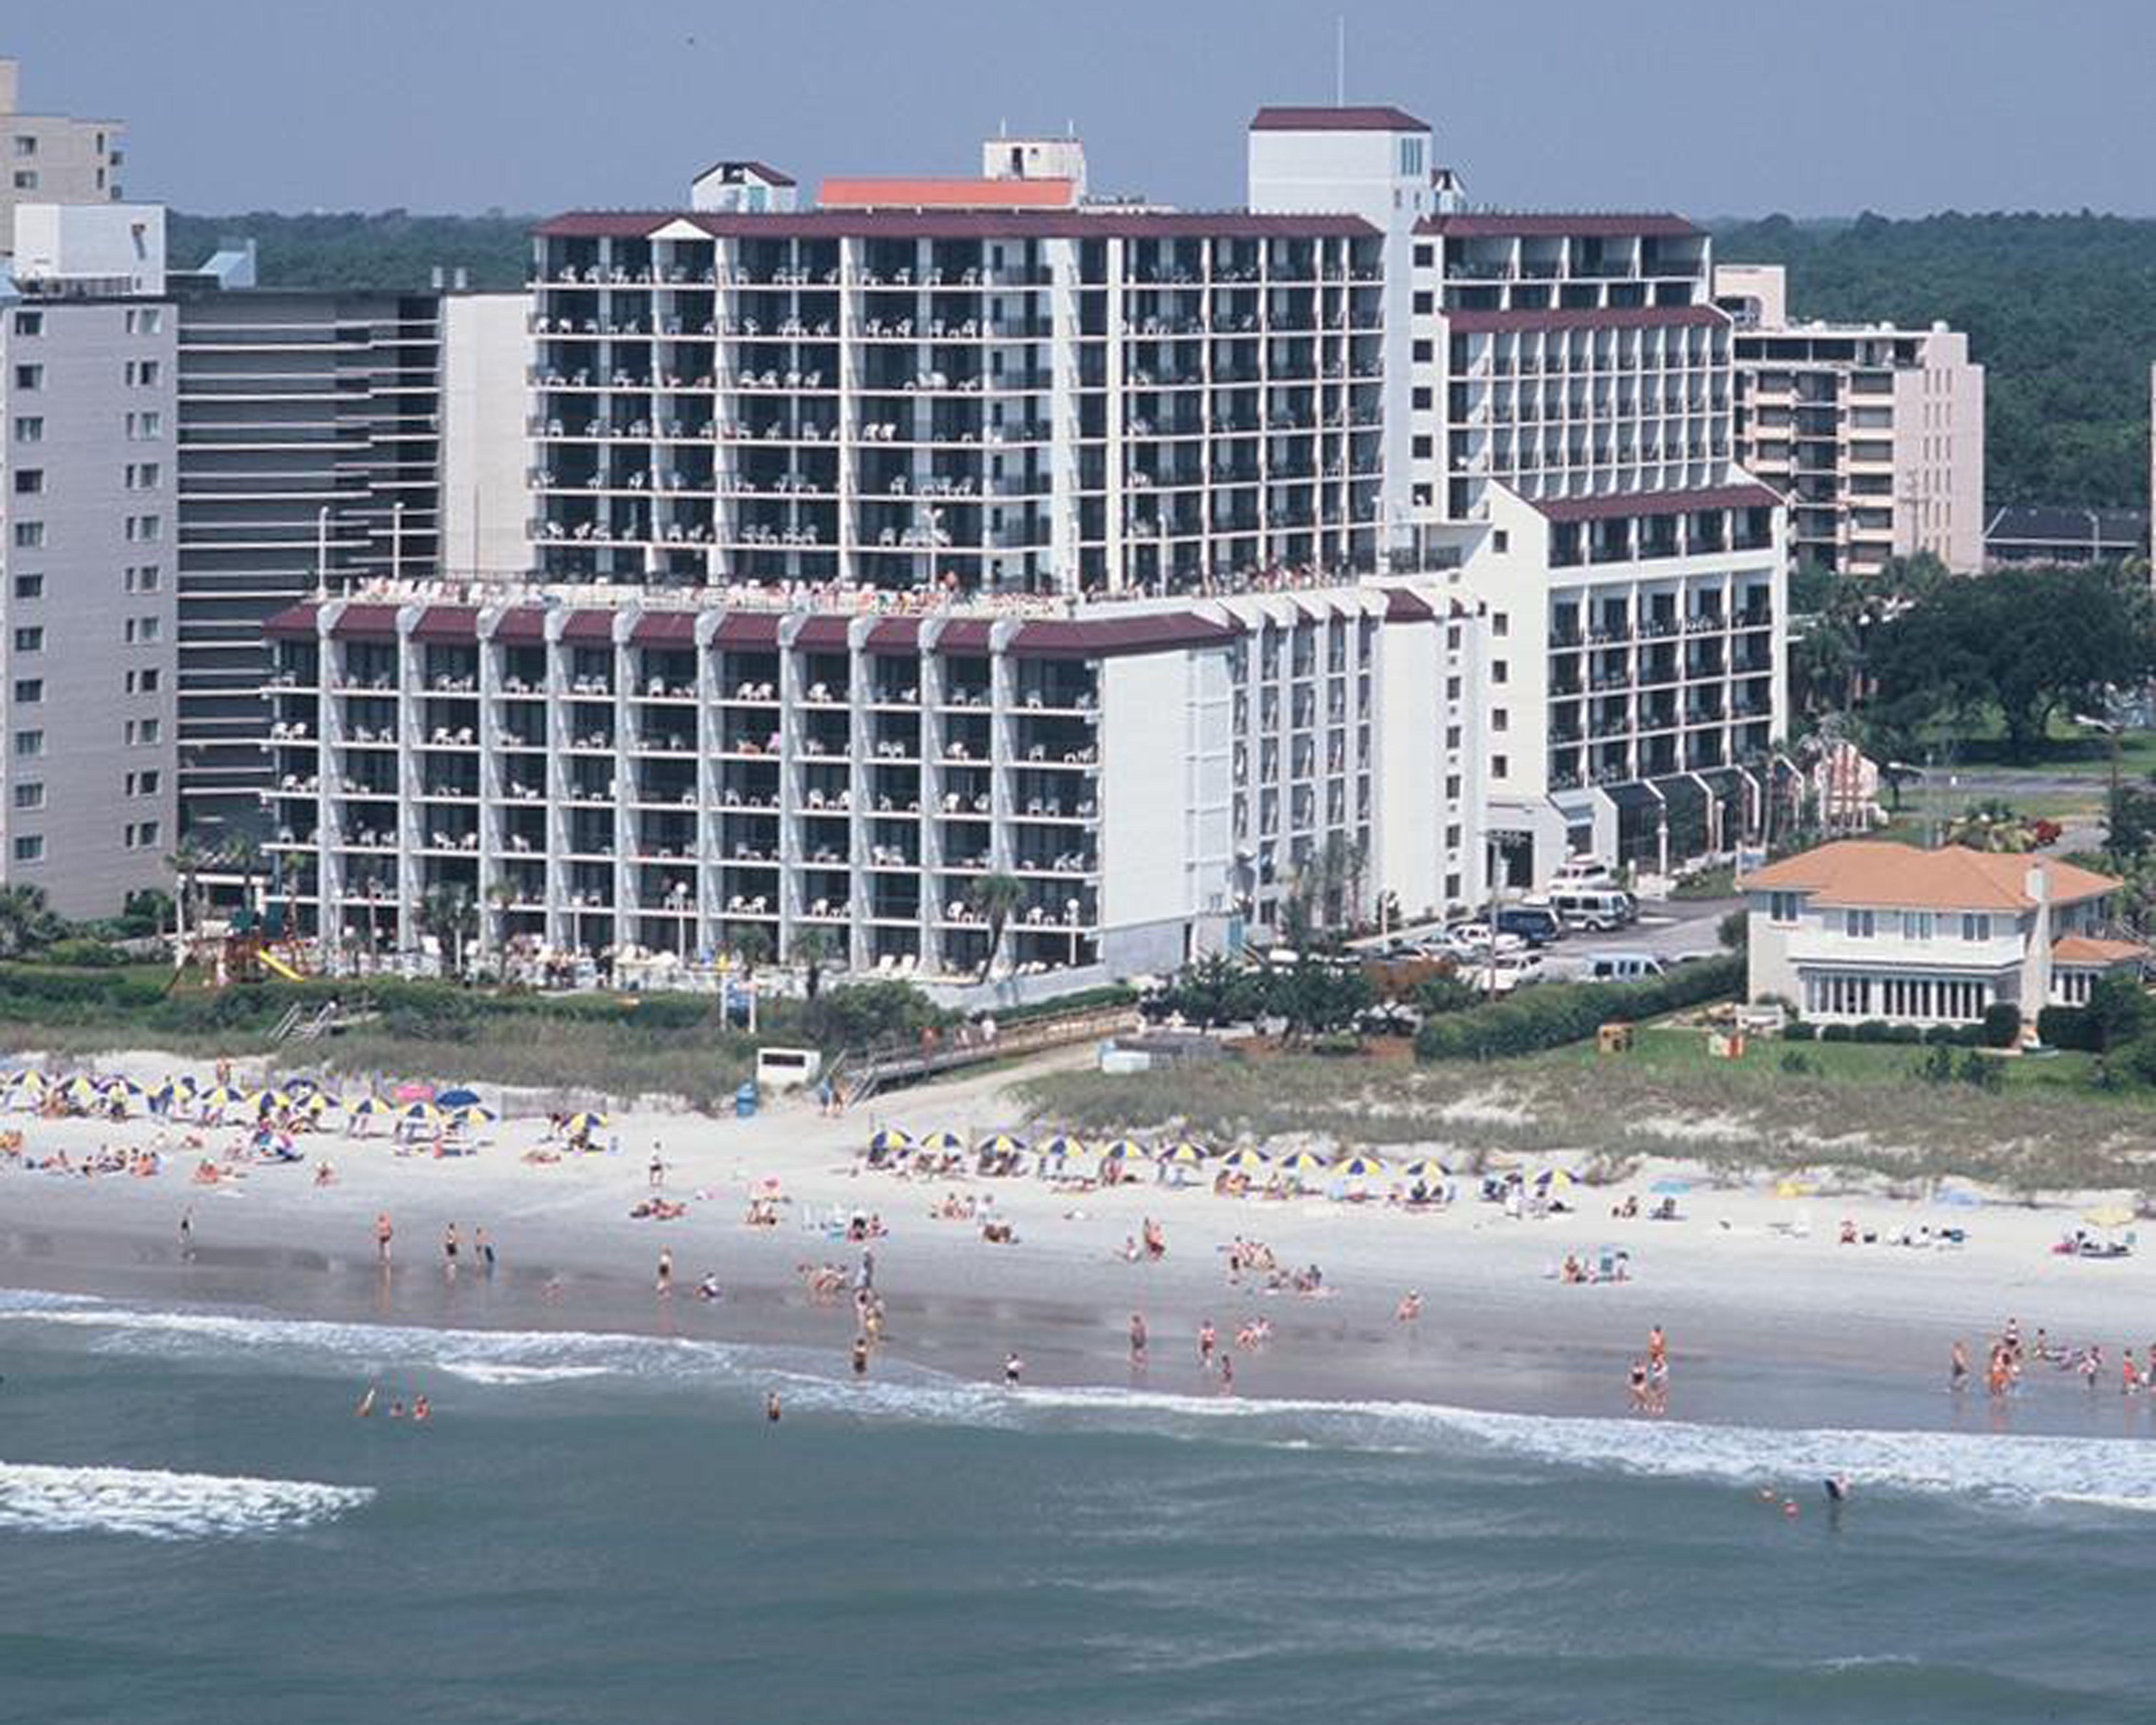 A Aerial View Of Grande Shores In Myrtle Beach South Carolina Myrtle Beach Hotels Ocean Resort Myrtle Beach